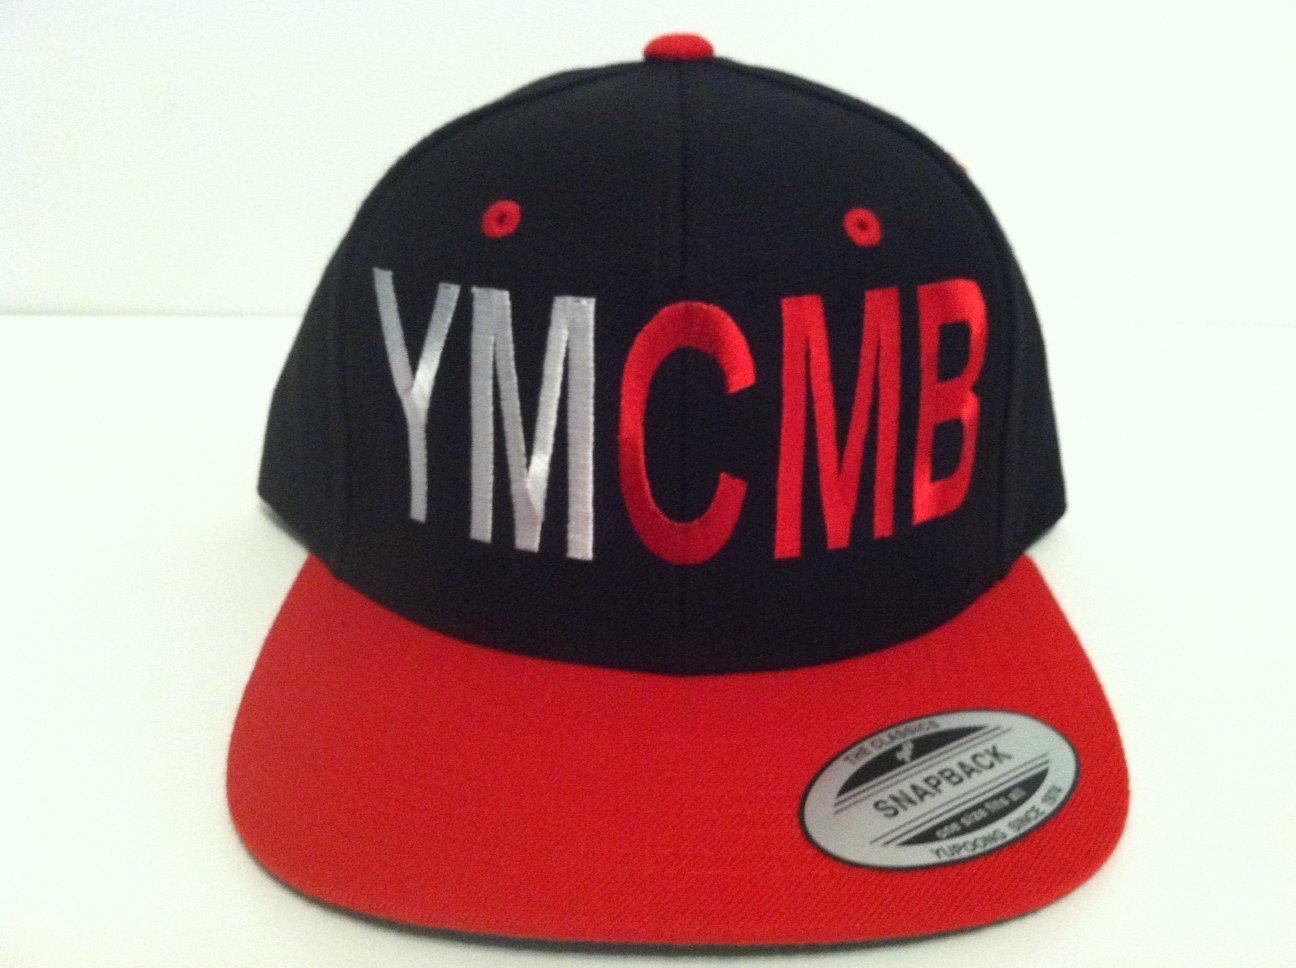 2cf79ab4f9b Get Quotations · Vintage YMCMB (Young Money Cash Money Billionair) Snapback  Hat